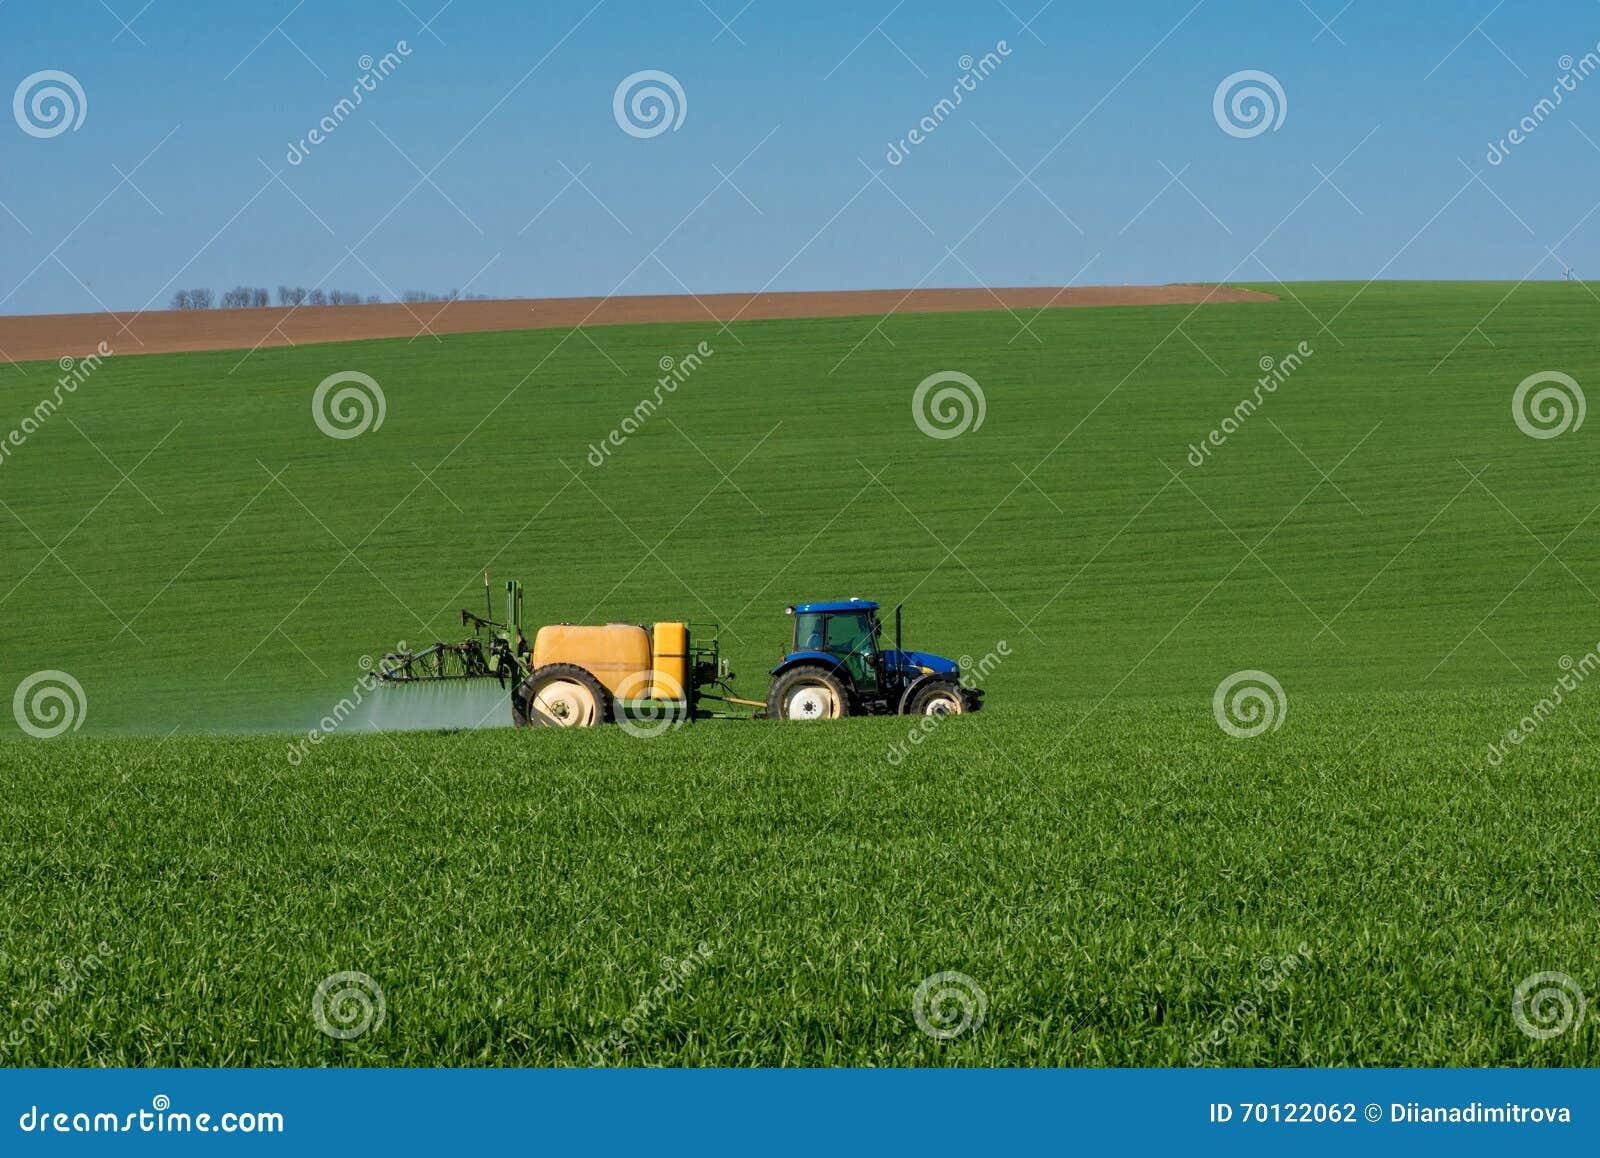 Traktor som besprutar bekämpningsmedlet i en veteåker